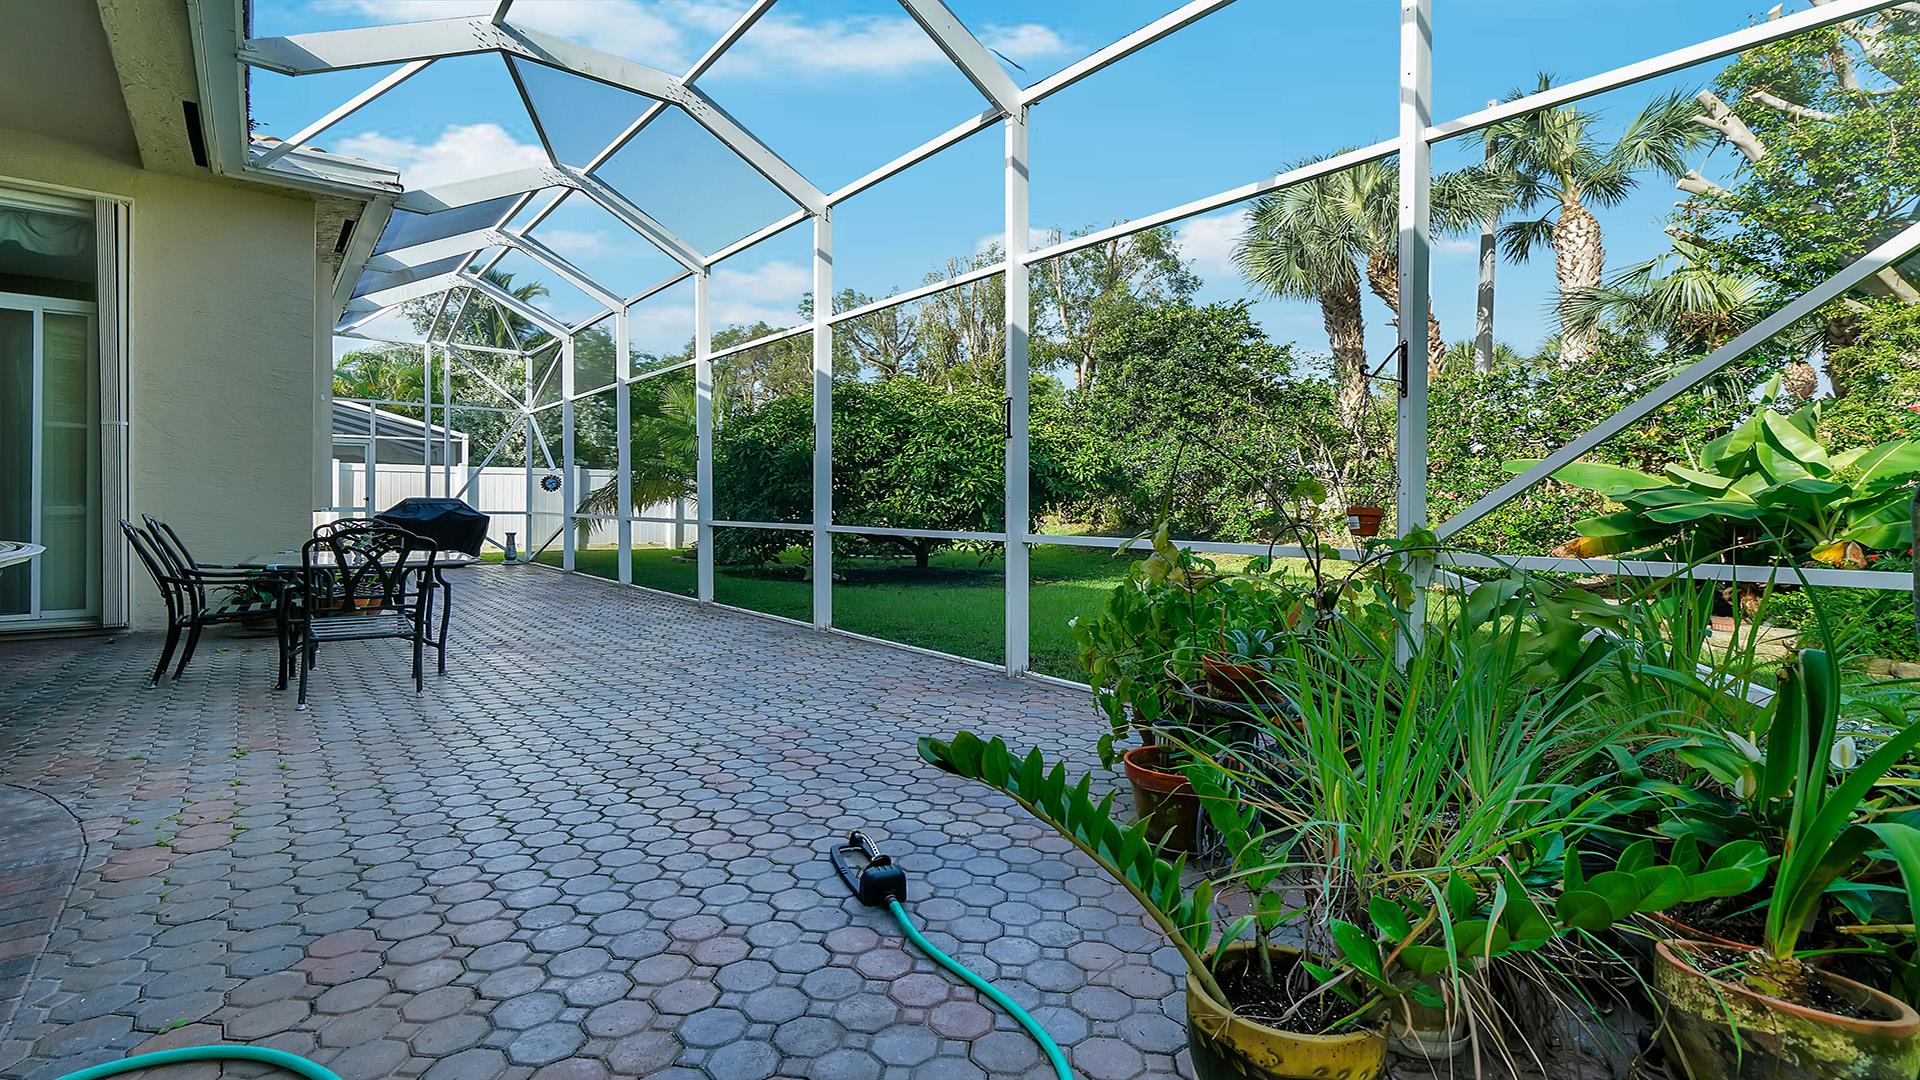 2719 Danforth Terrace West Palm Beach Fl 33414 Lake